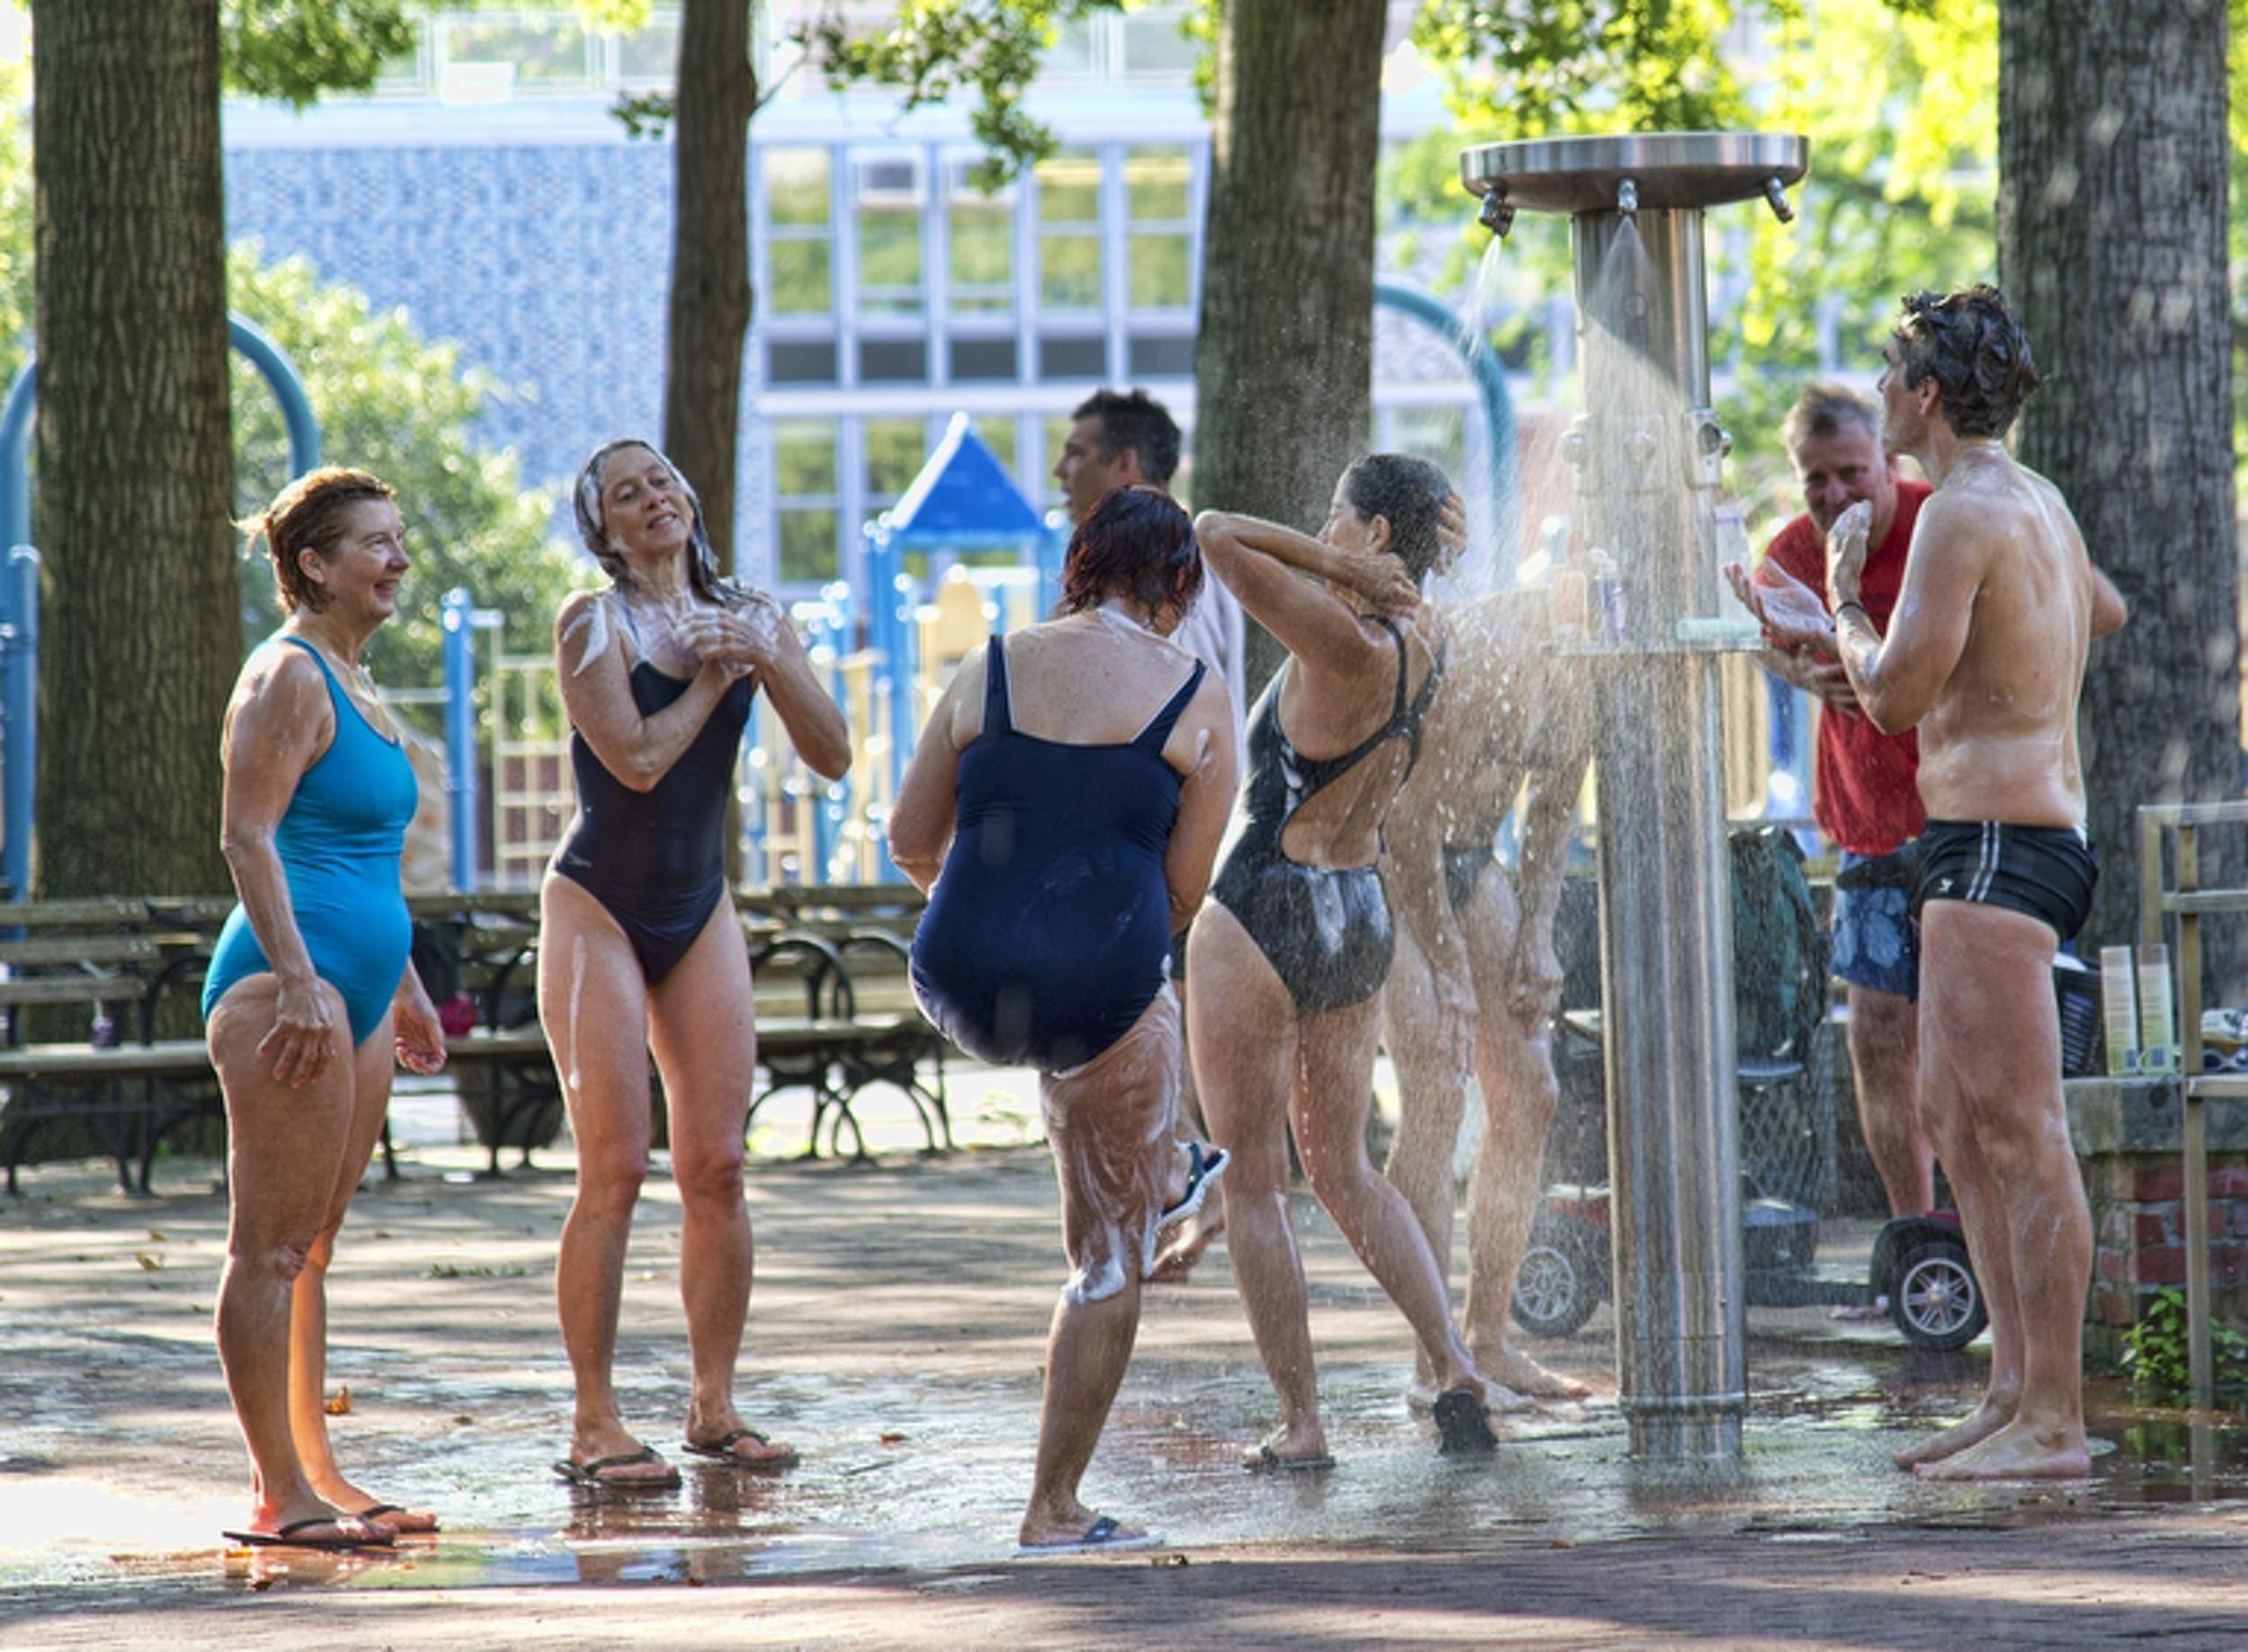 Bathers, Bryant Park